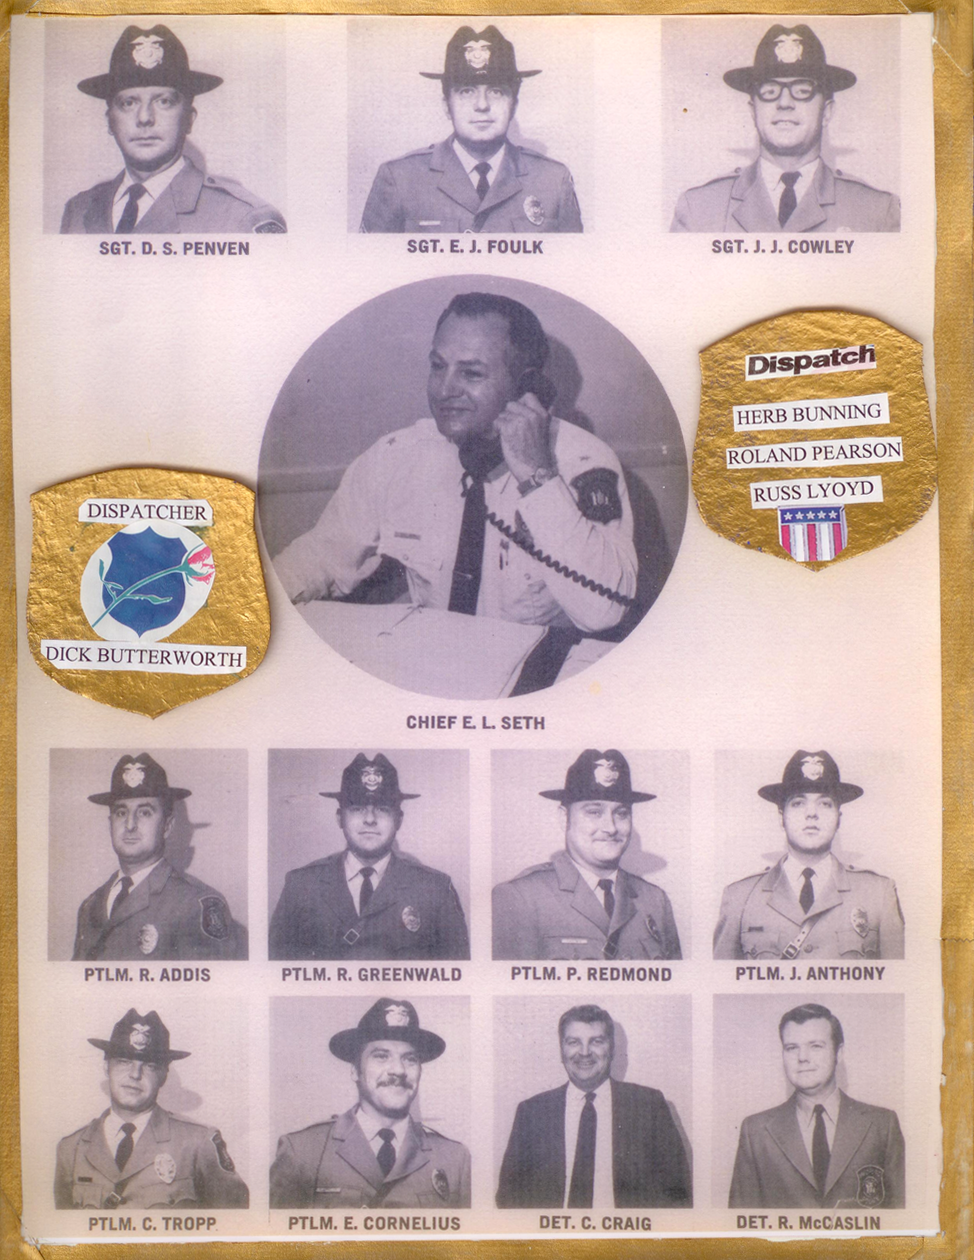 1968 Departmental Photo